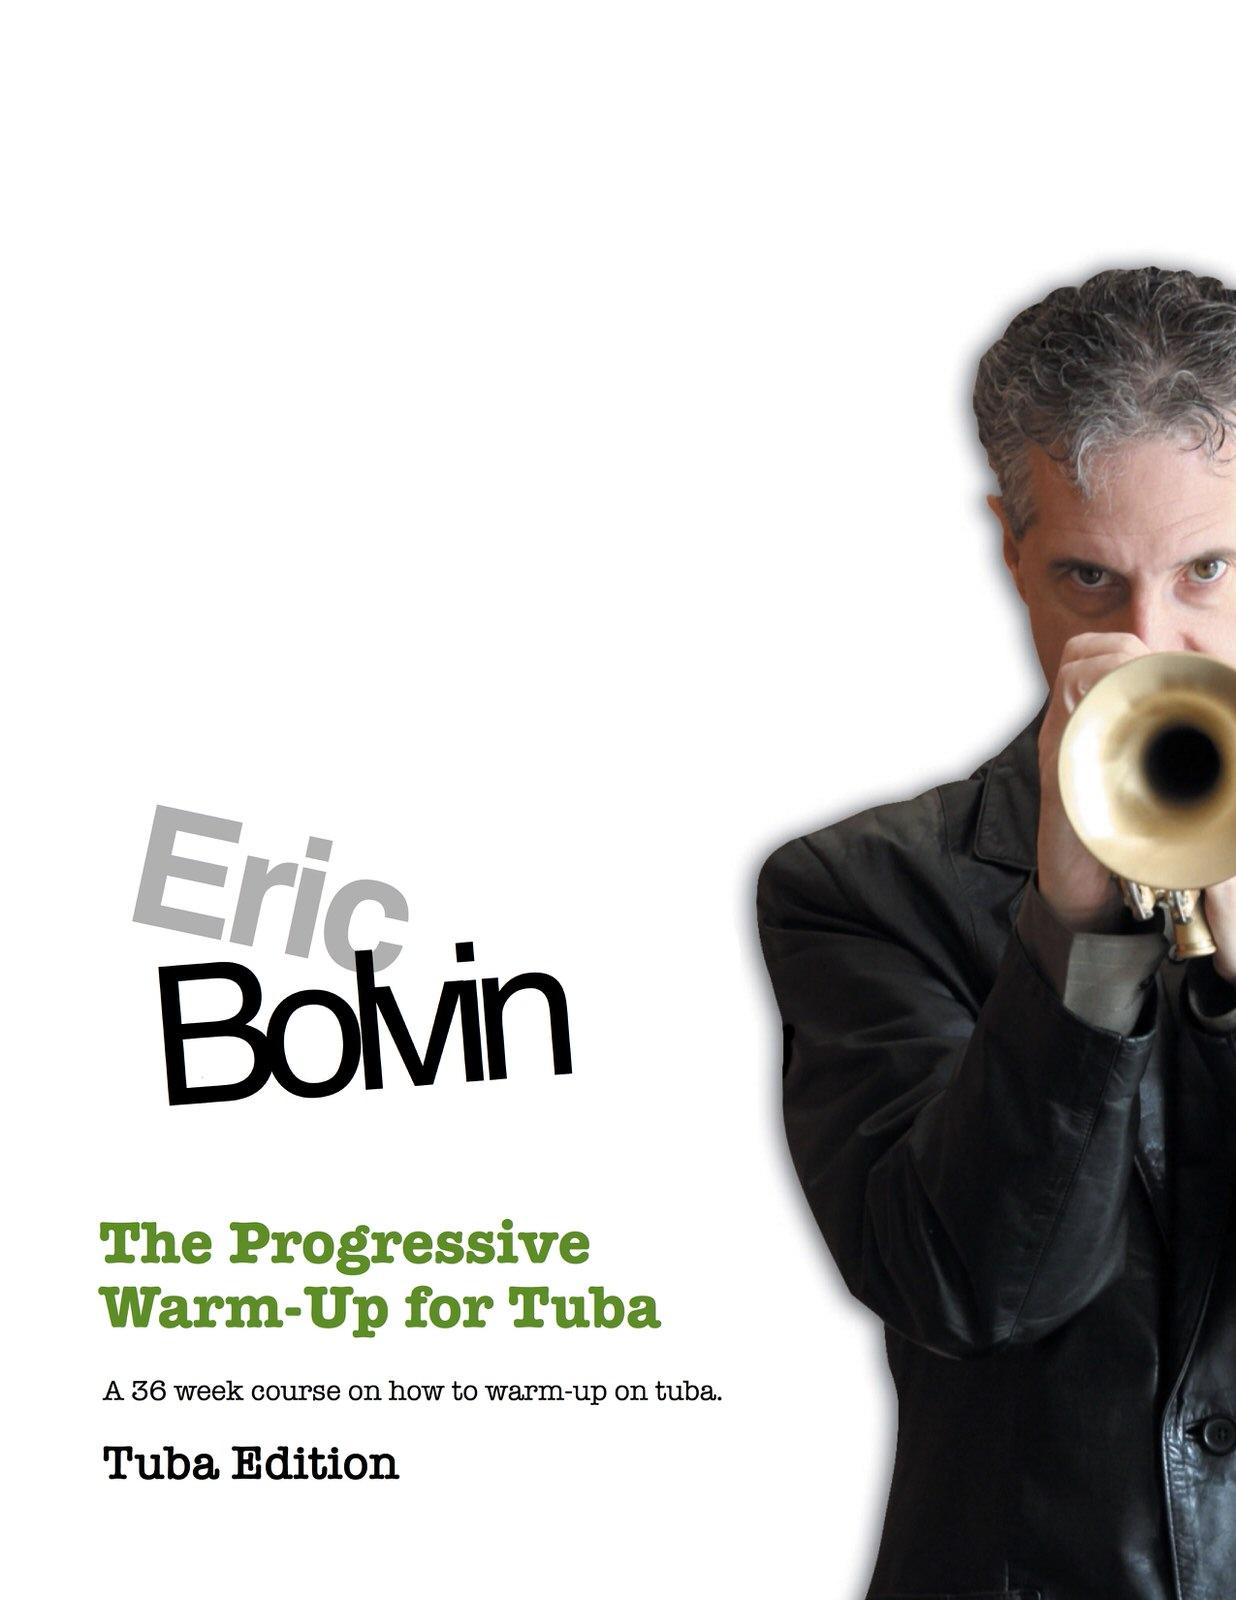 Bolvin, The Progresive Warm Up tuba-p01